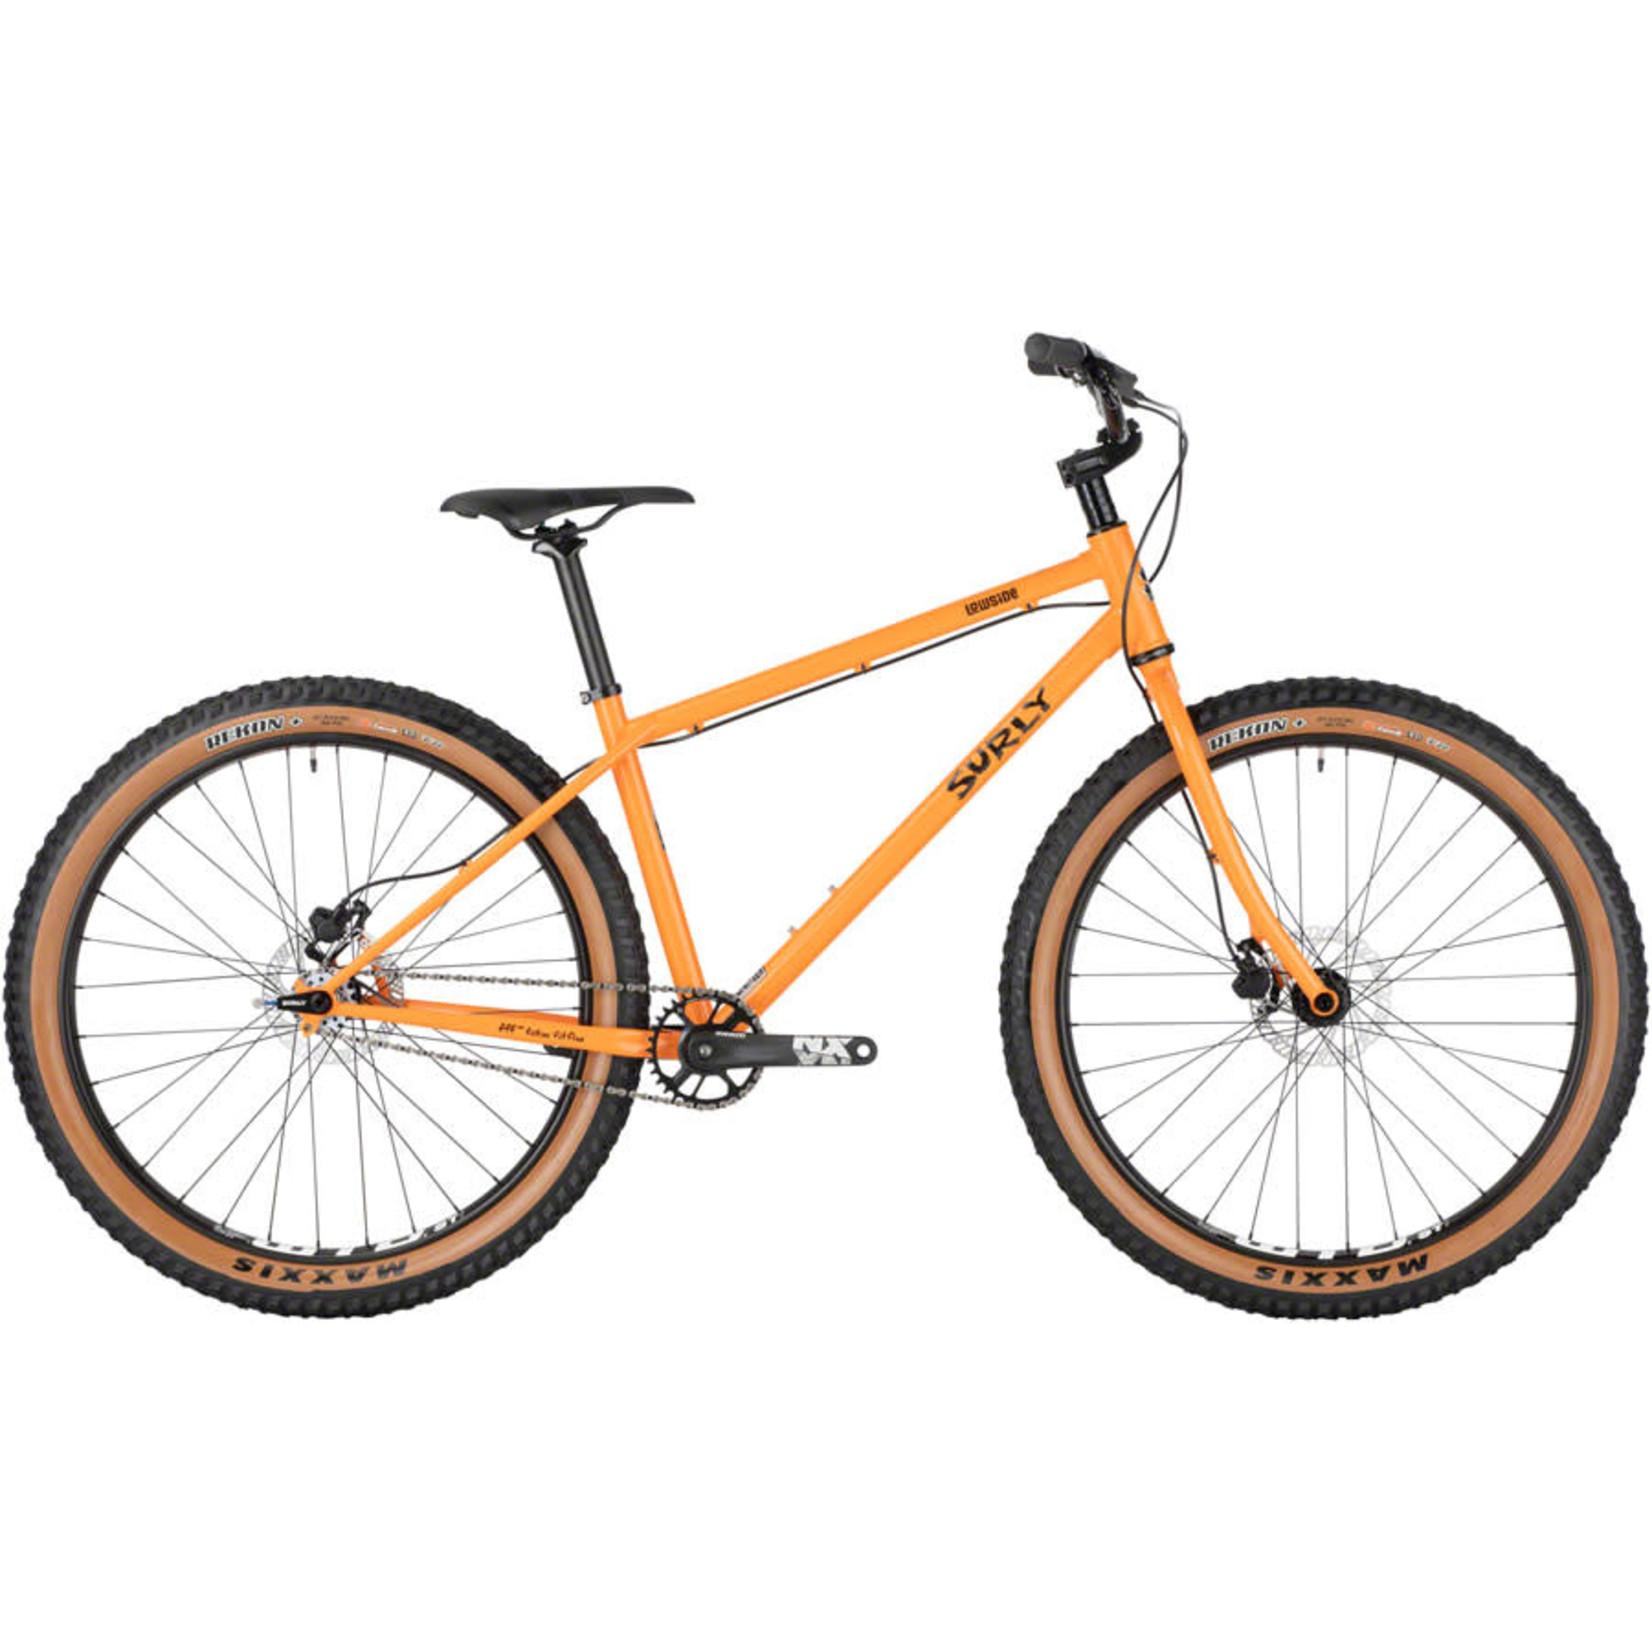 "Surly Surly Lowside Bike - 27.5"", Steel, Dream Tangerine, Medium"